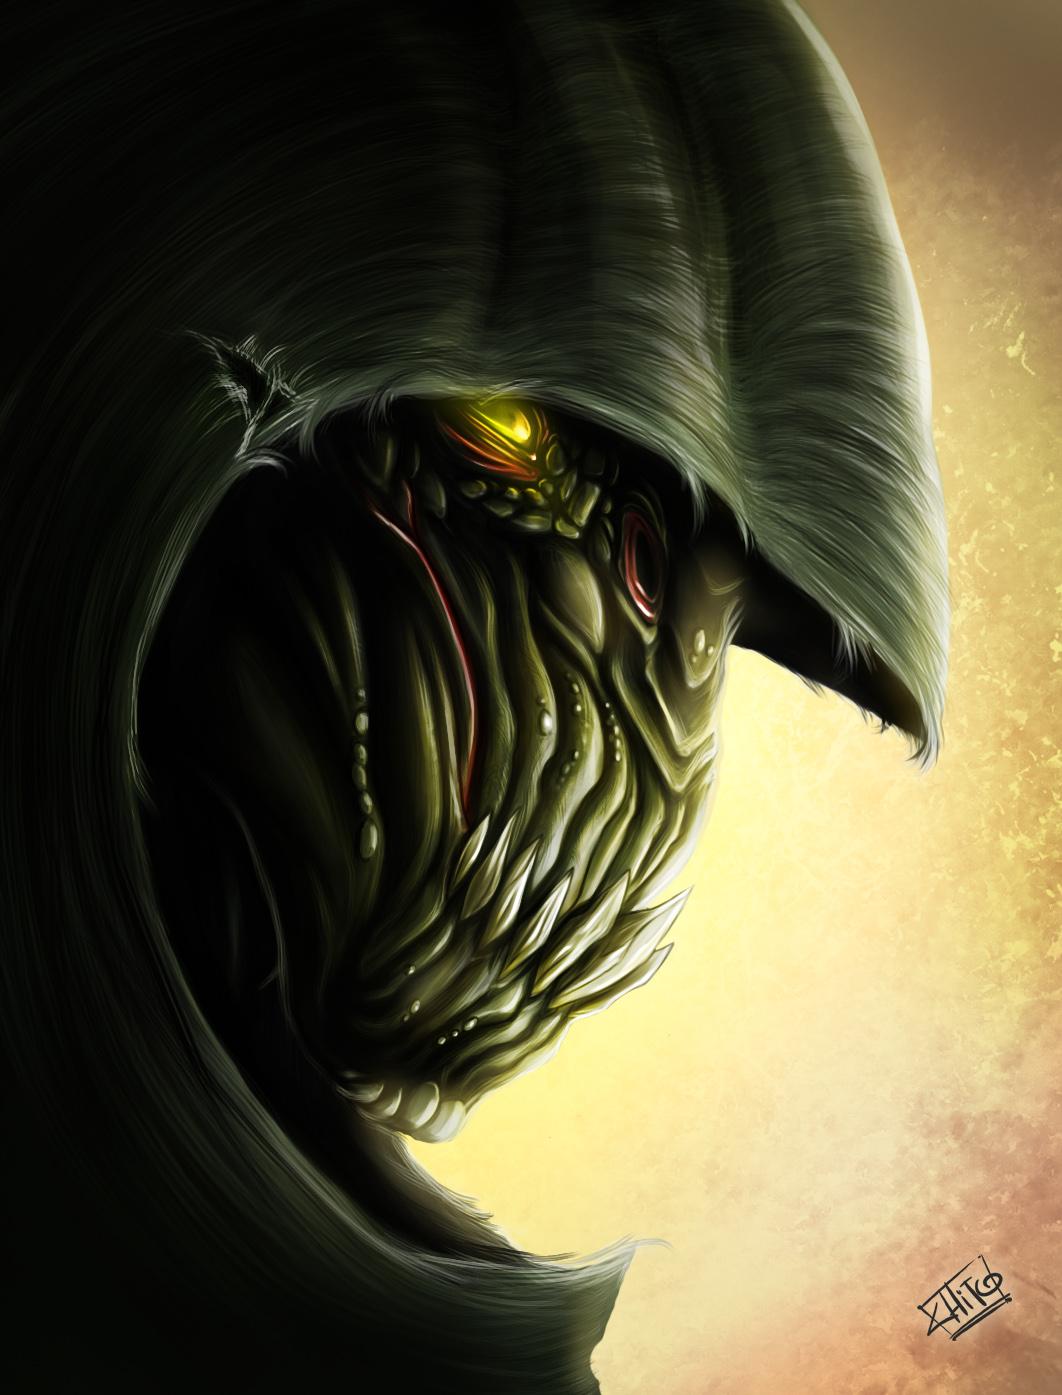 The Lizard by ManuDGI